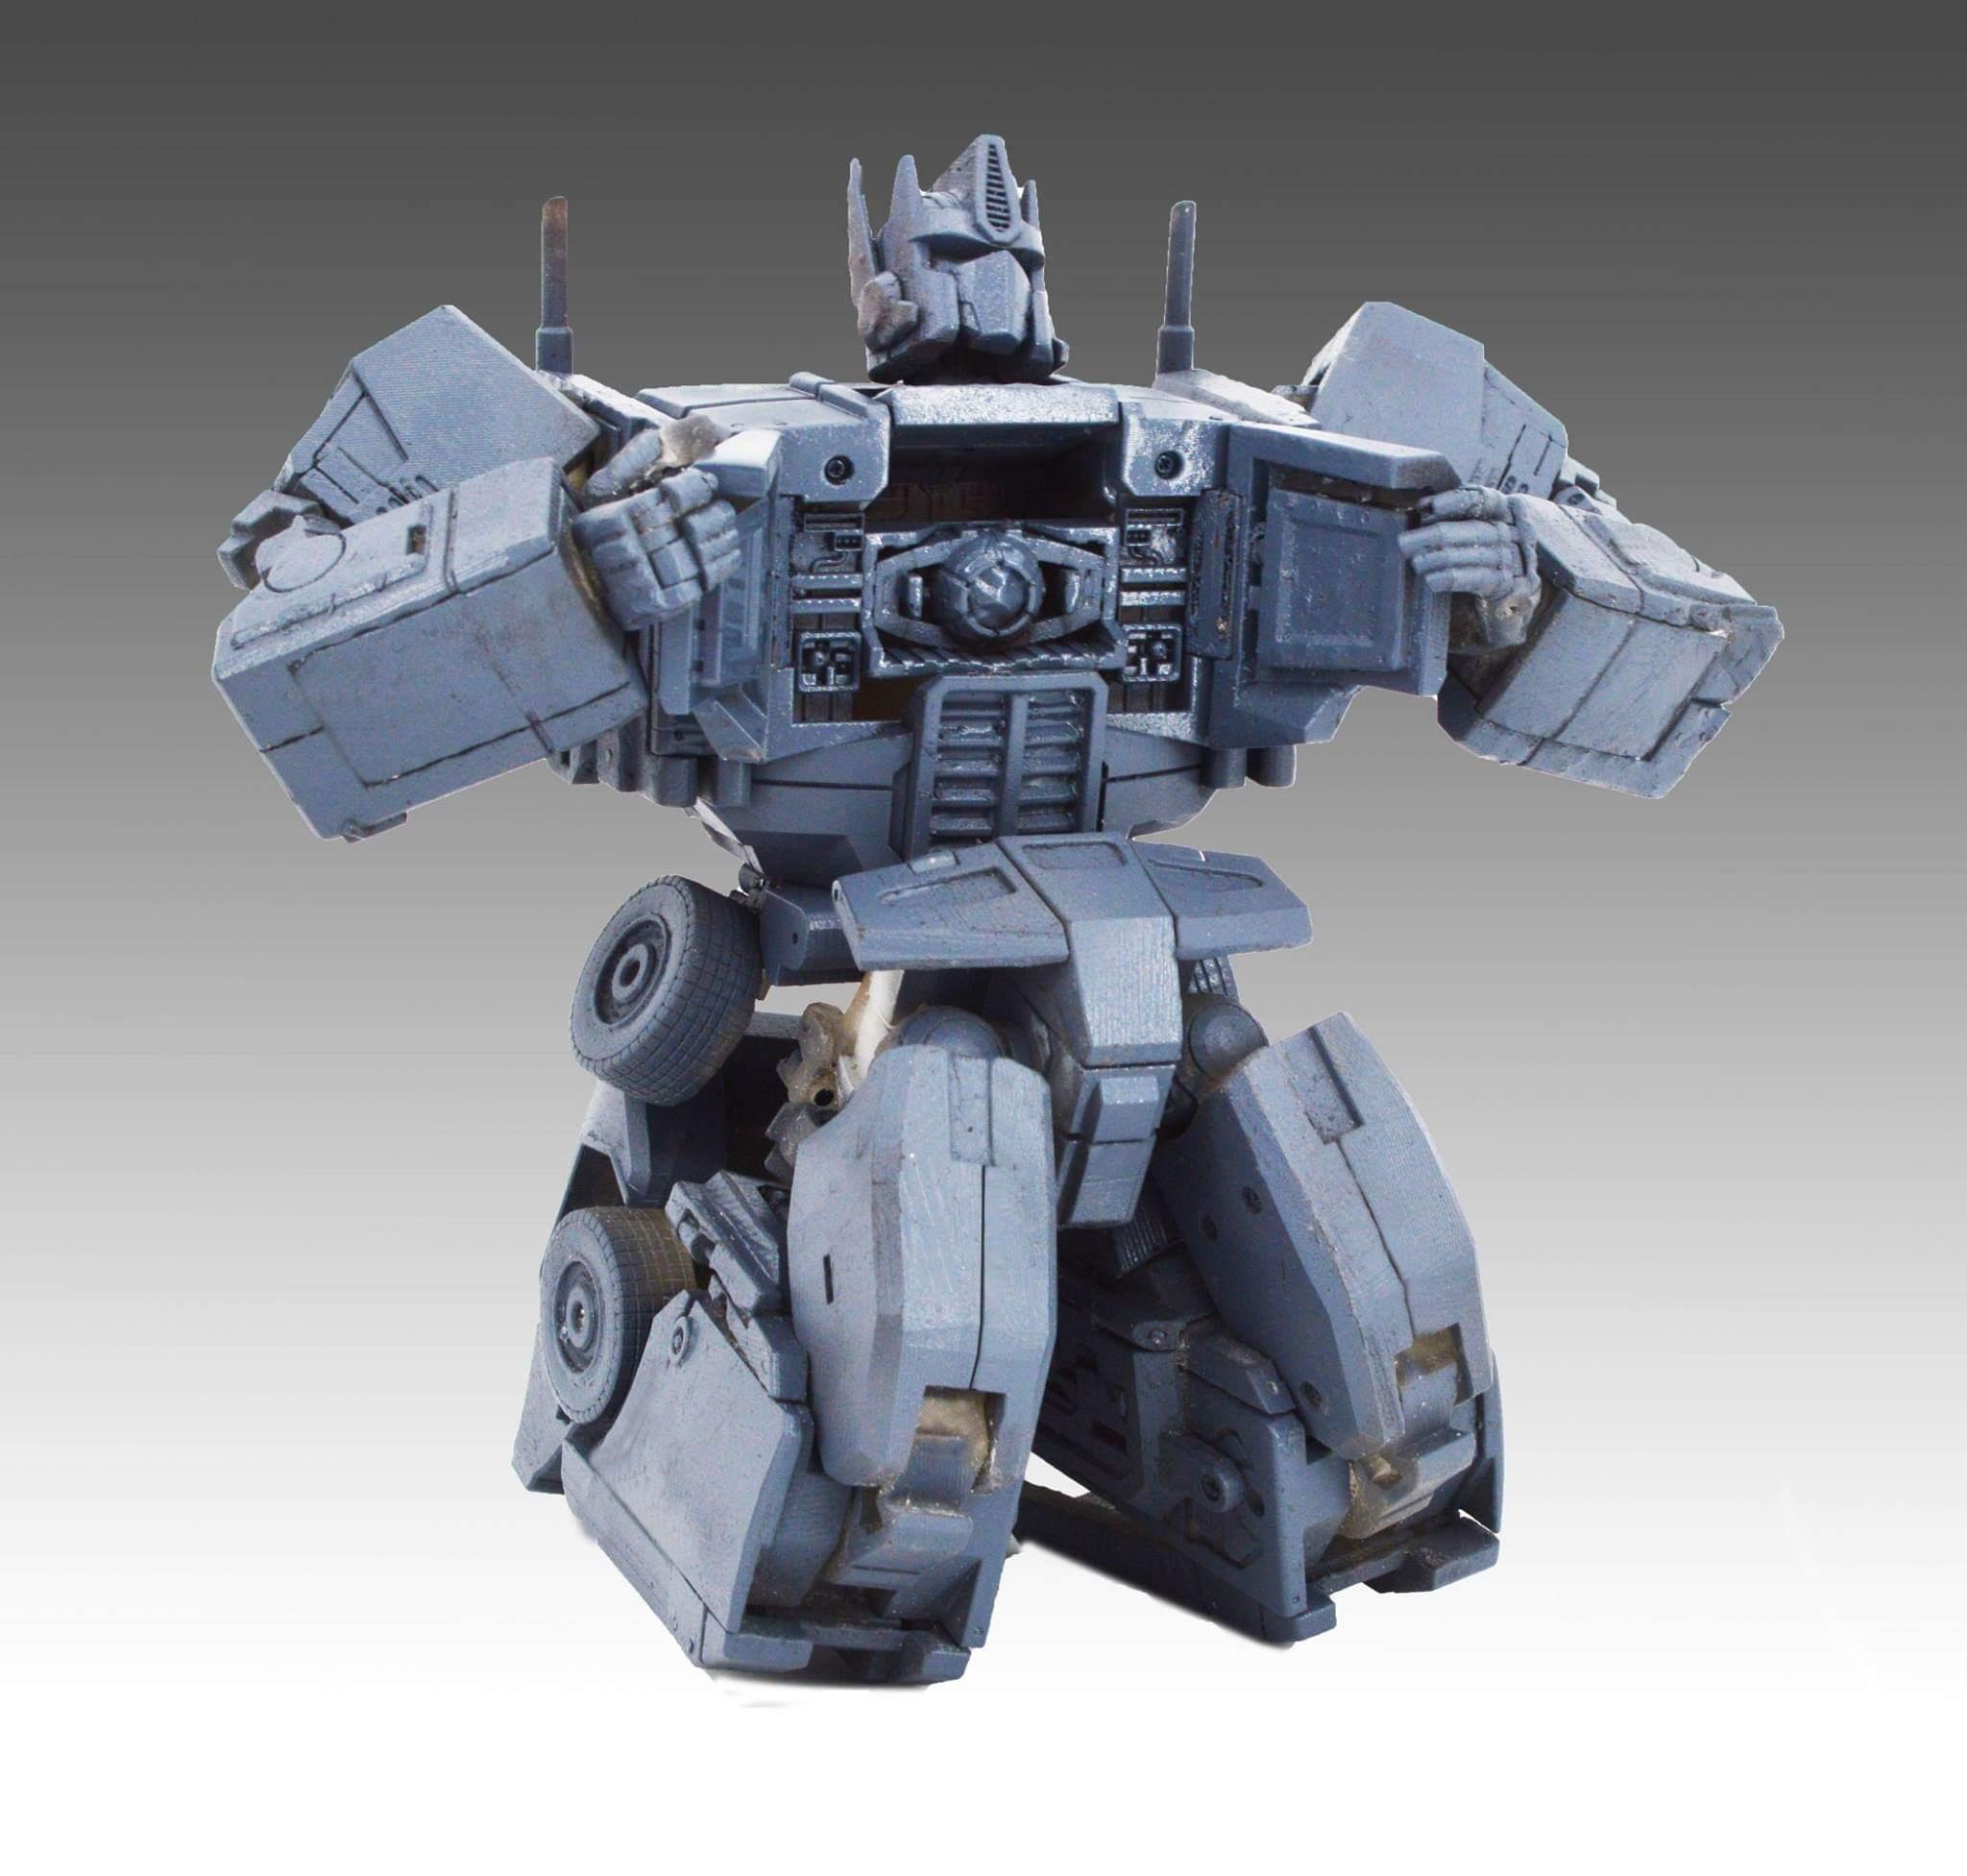 [KFC Toys] Produit Tiers - PC-14 Raijin + PC-15 Grand Raijin + P-16 Raiju - aka Ginrai (Powermaster Optimus) + Remorque de Ginrai + Godbomber = God Ginrai (TF Masterforce) XC4AjV9B_o